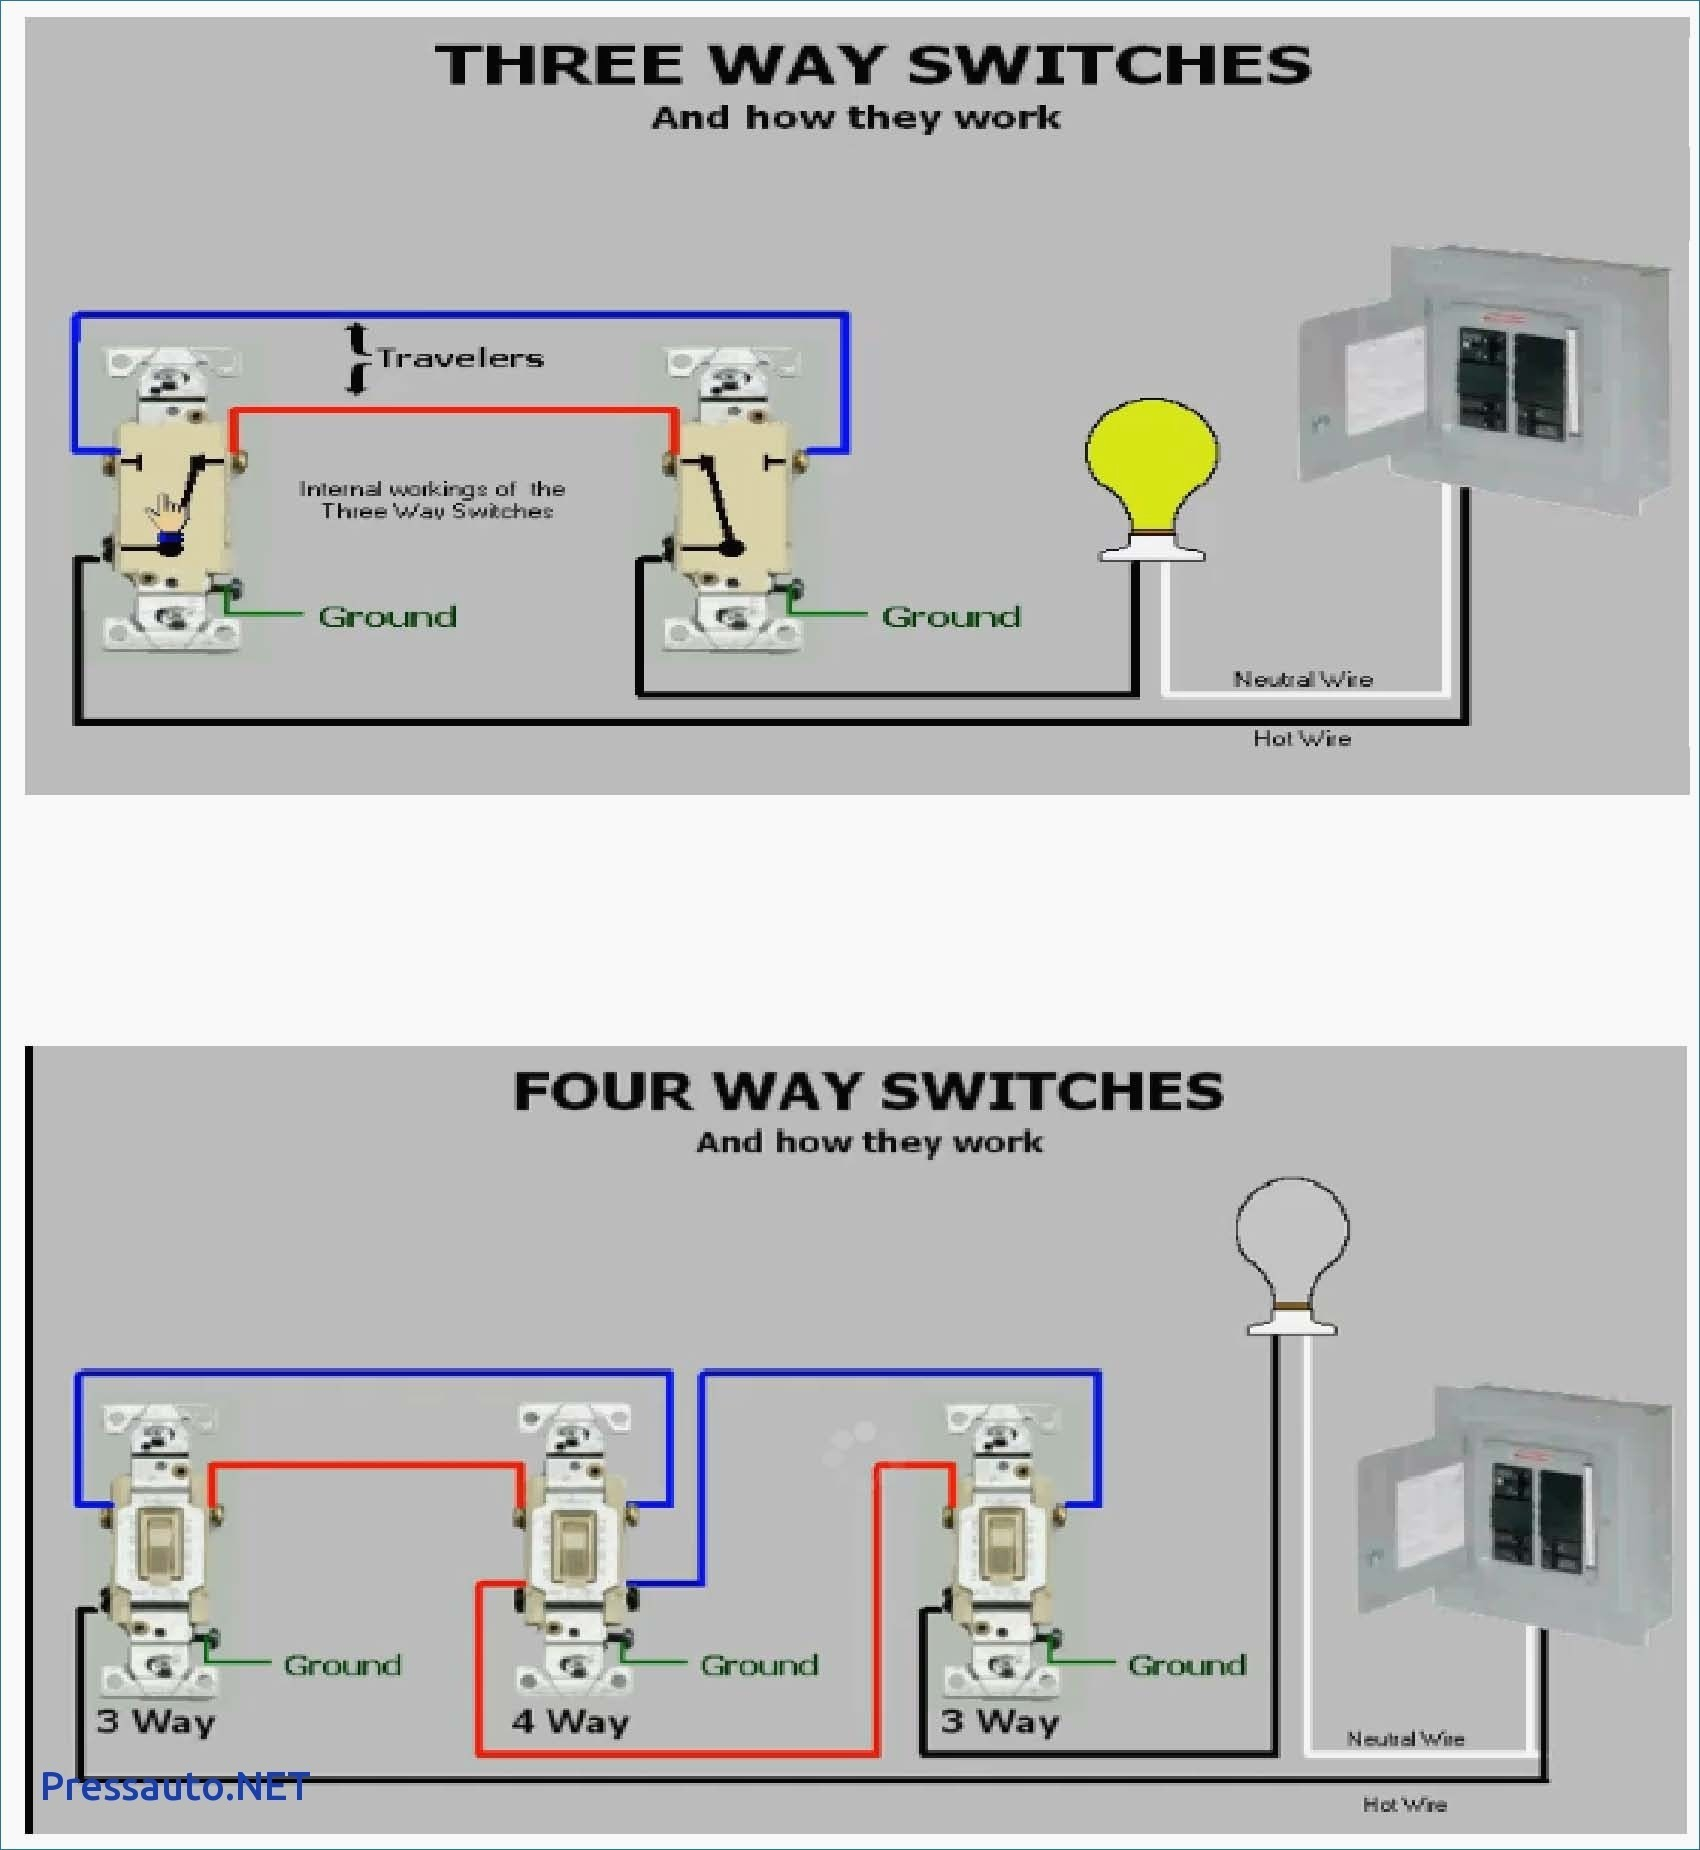 Wiring Diagram Multiple Lights 3 Way Switch Best With A Of - Allove - 3 Way Switch Wiring Diagram Multiple Lights